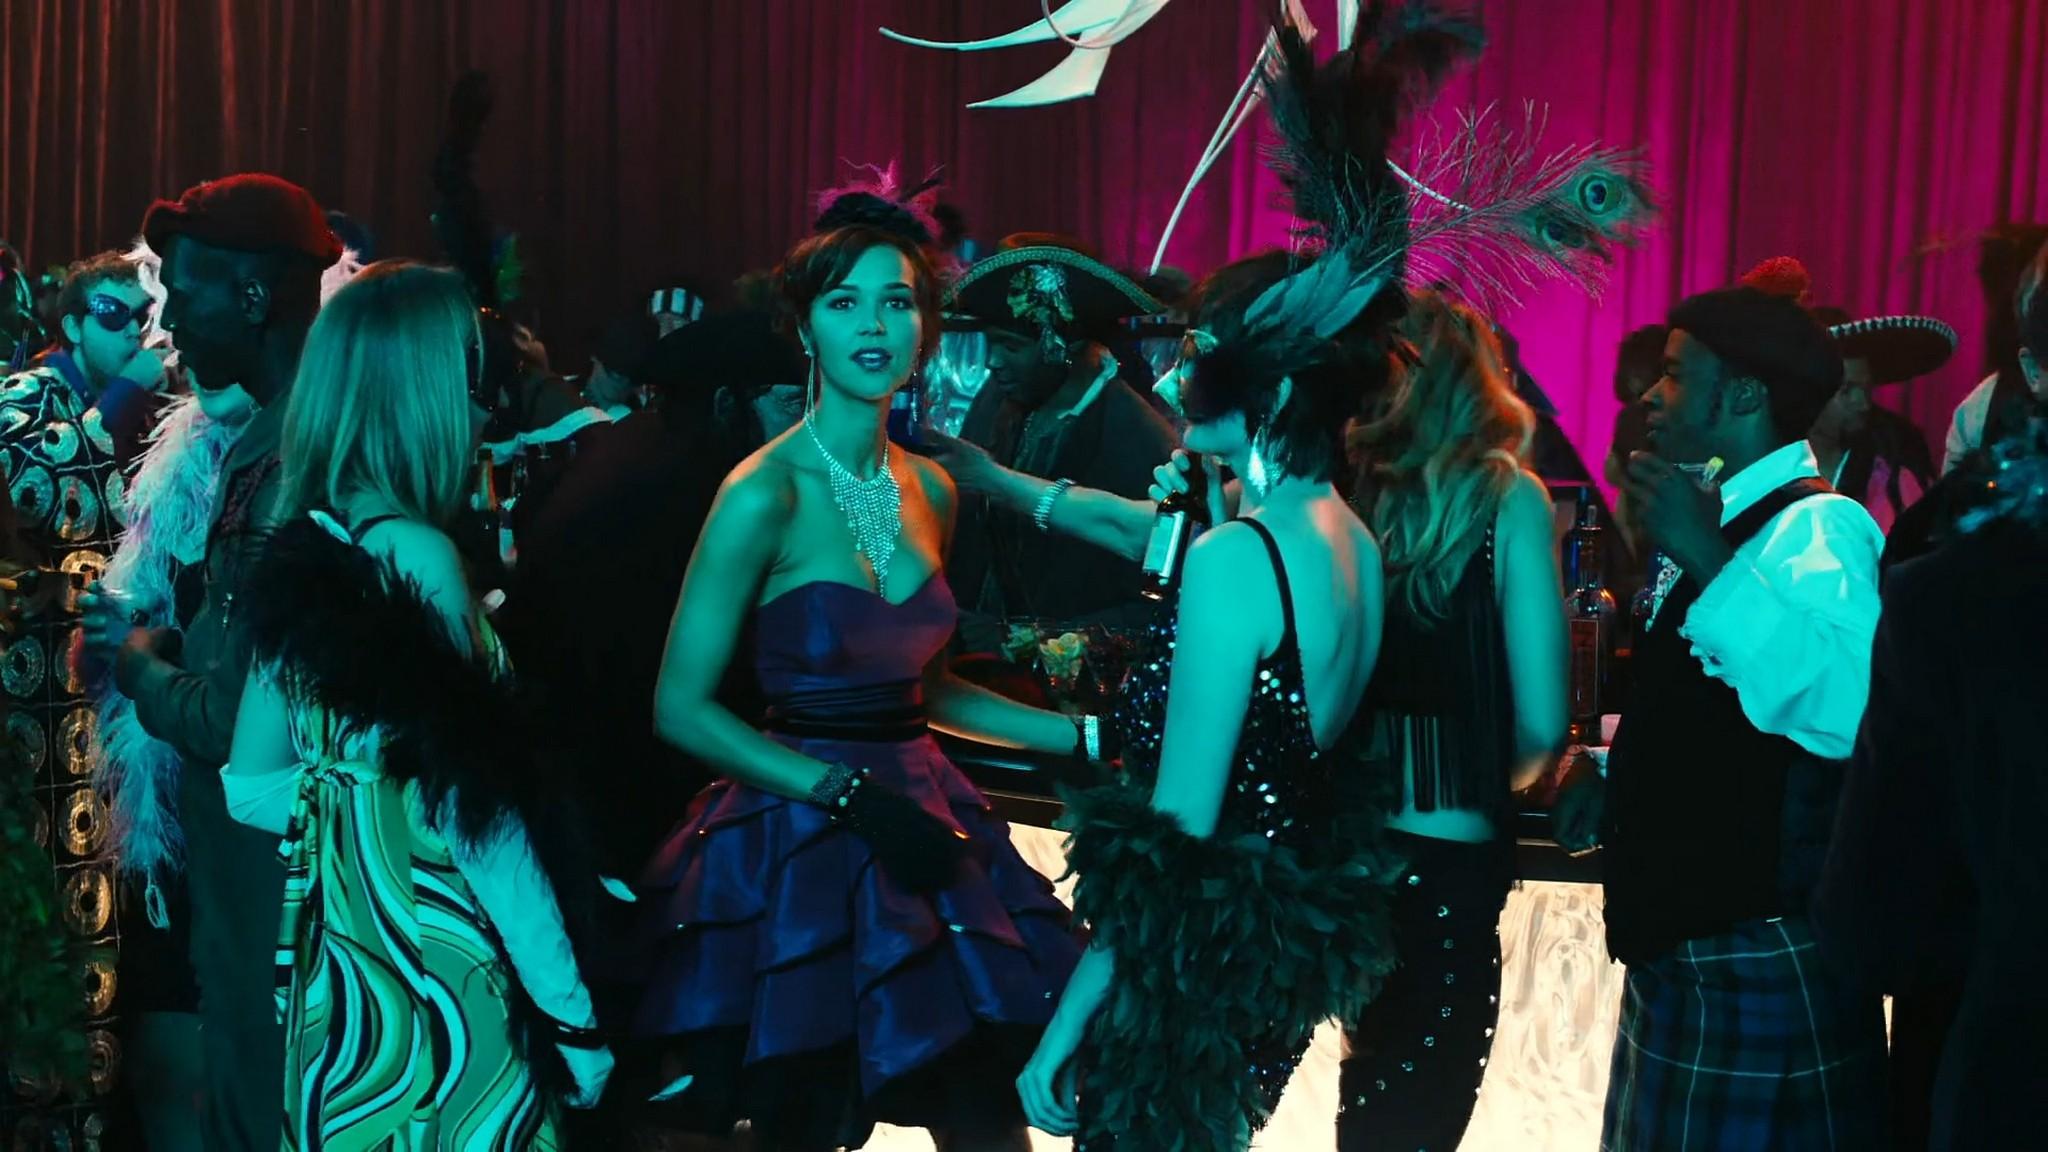 Danneel Ackles nude Carmen Electra, Arielle Kebbel, sexy otherrs nude and hot - Mardi Gras: Spring Break (2011) HD 1080p WEb (4)